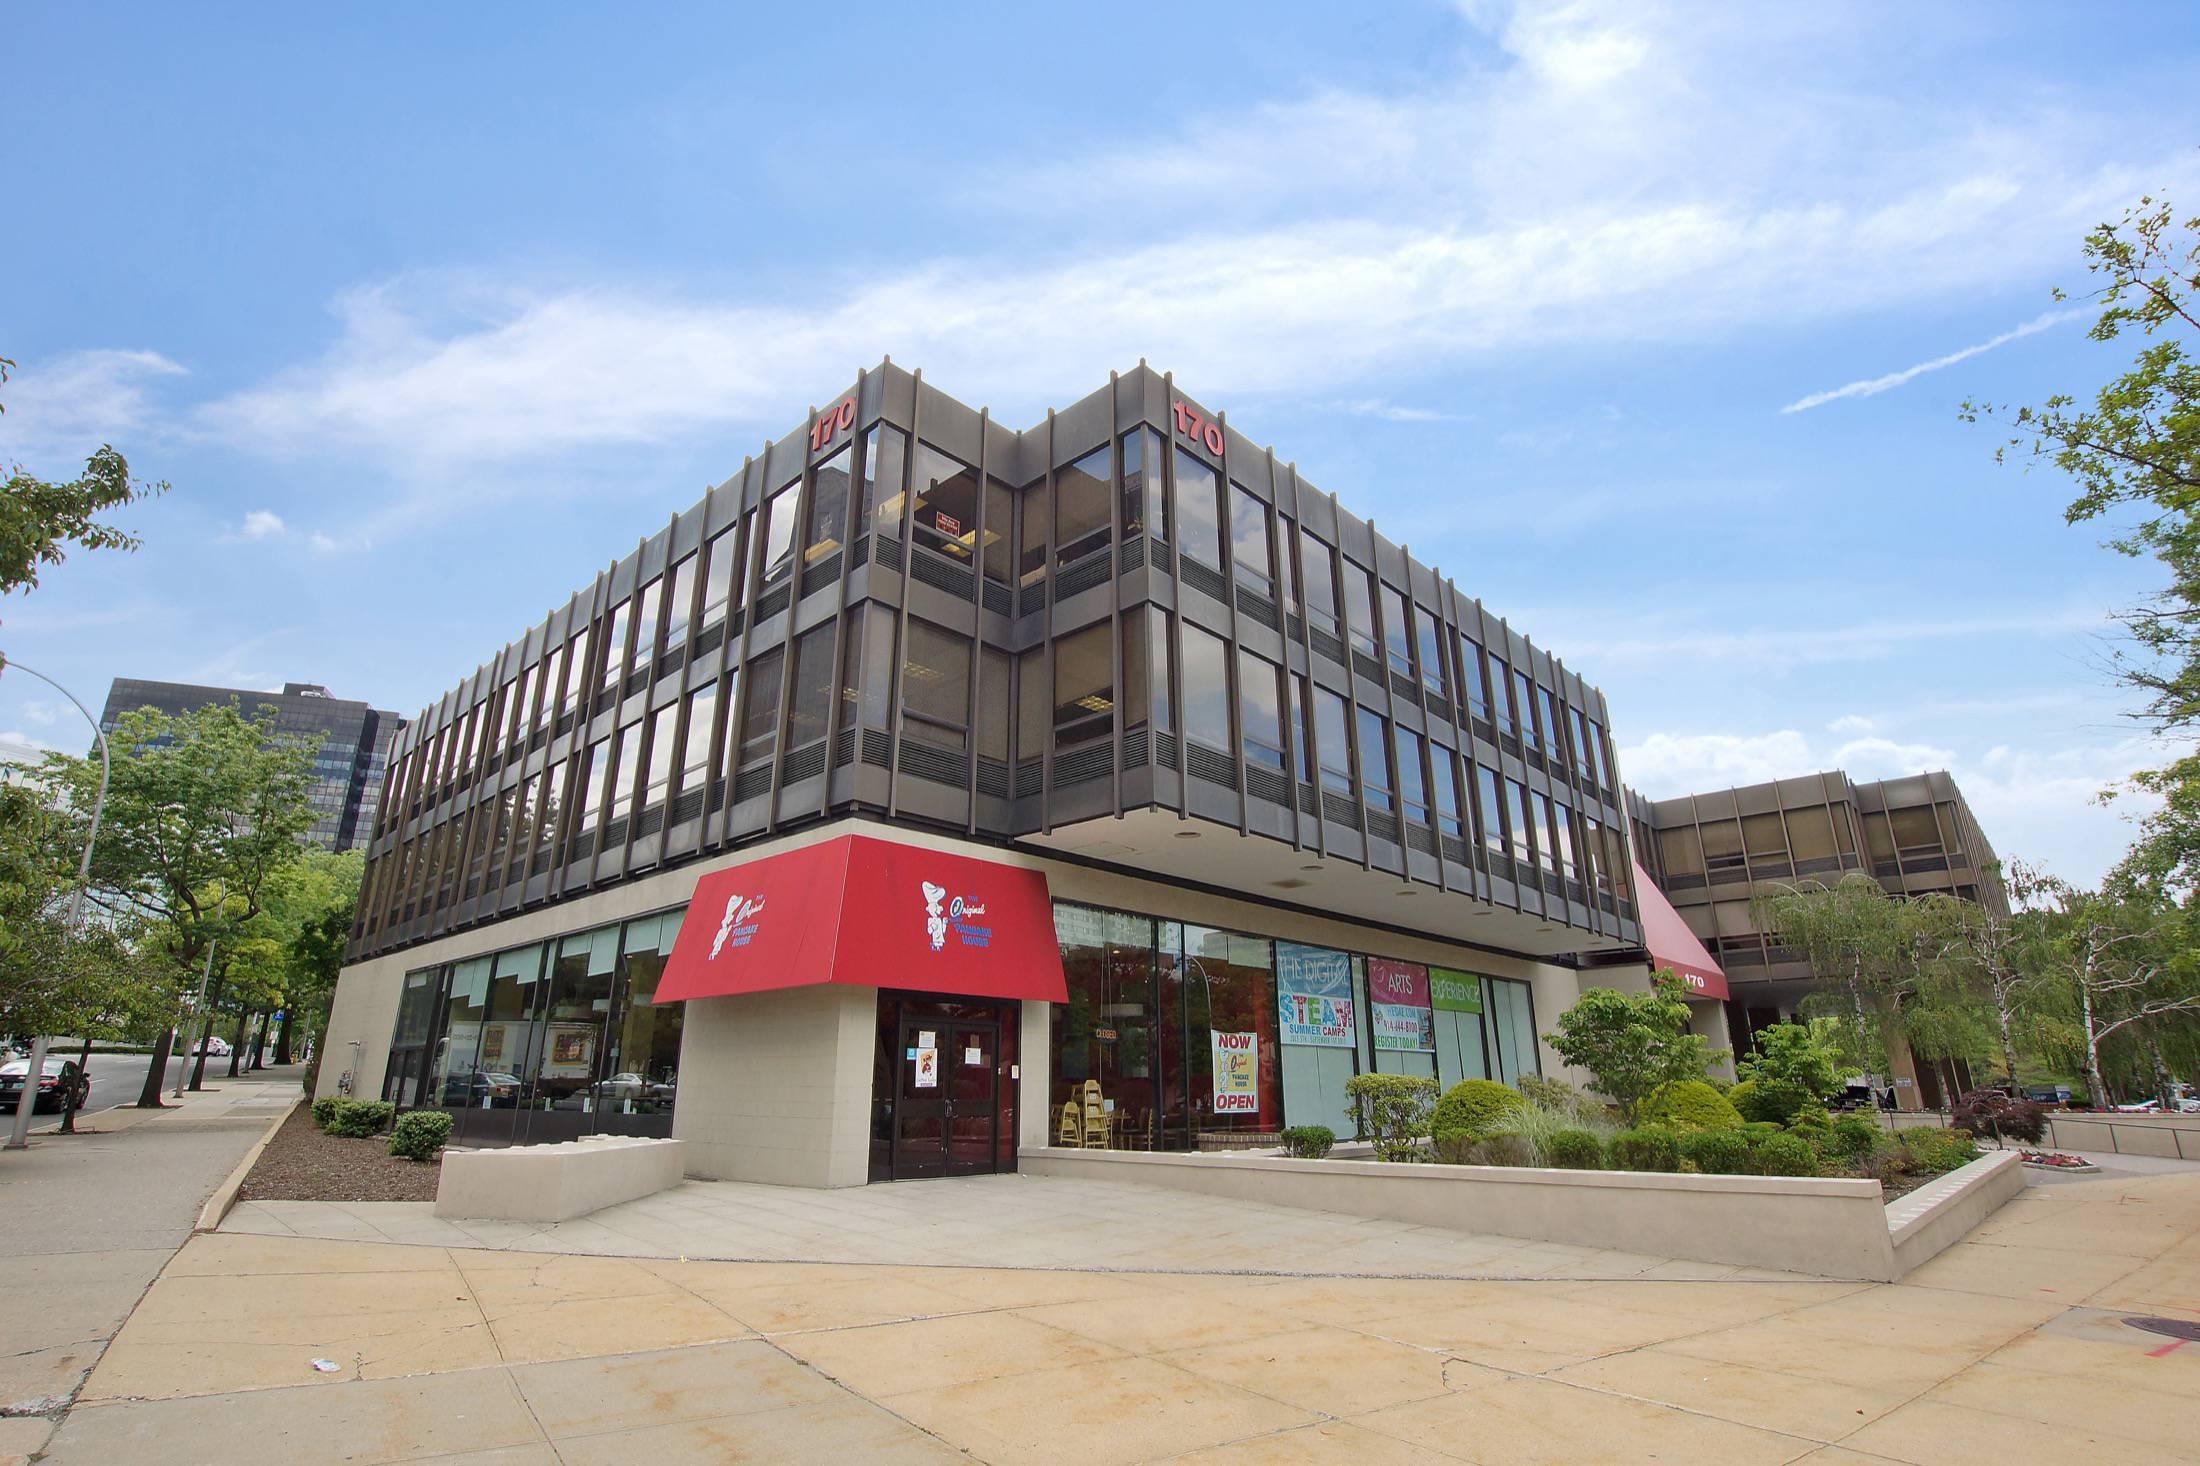 170 Hamilton Avenue – White Plains, NY 10601 – 3,039 sq. ft.